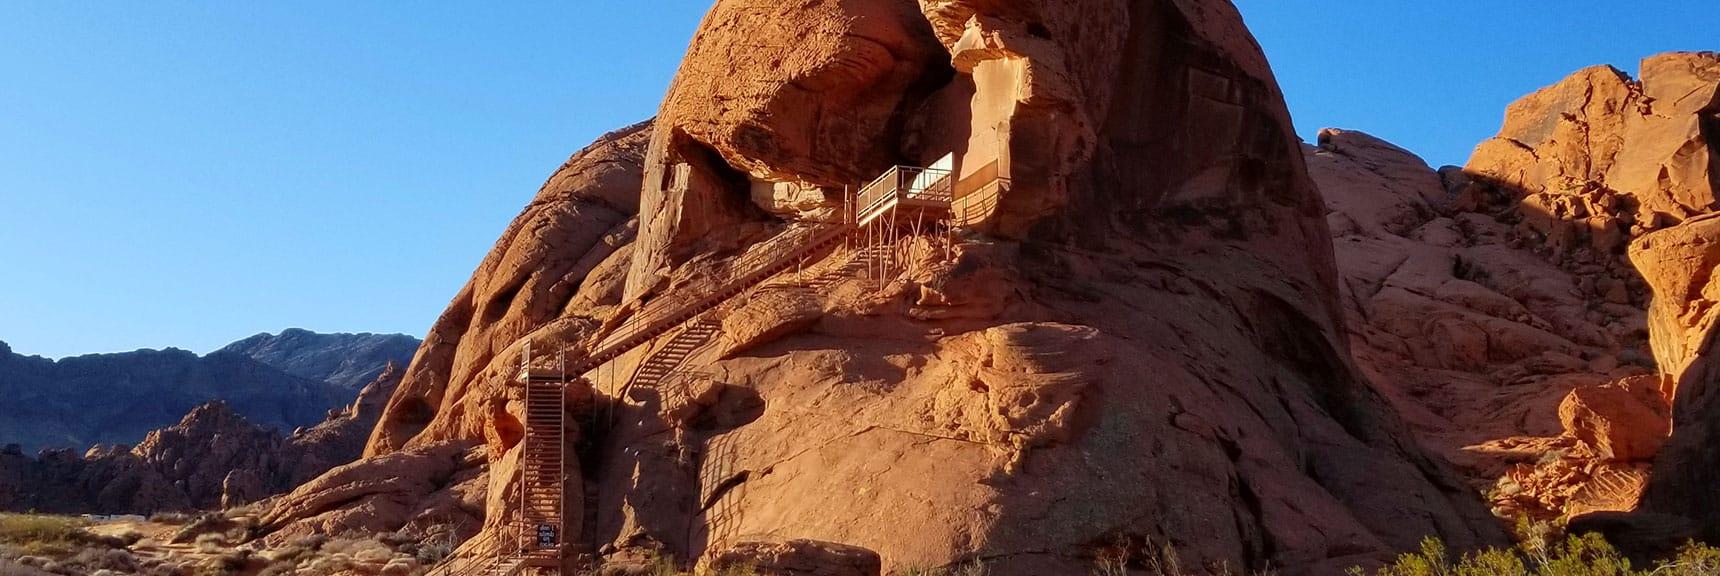 Atlatl Rock Petroglyphs in Valley of Fire State Park, Nevada